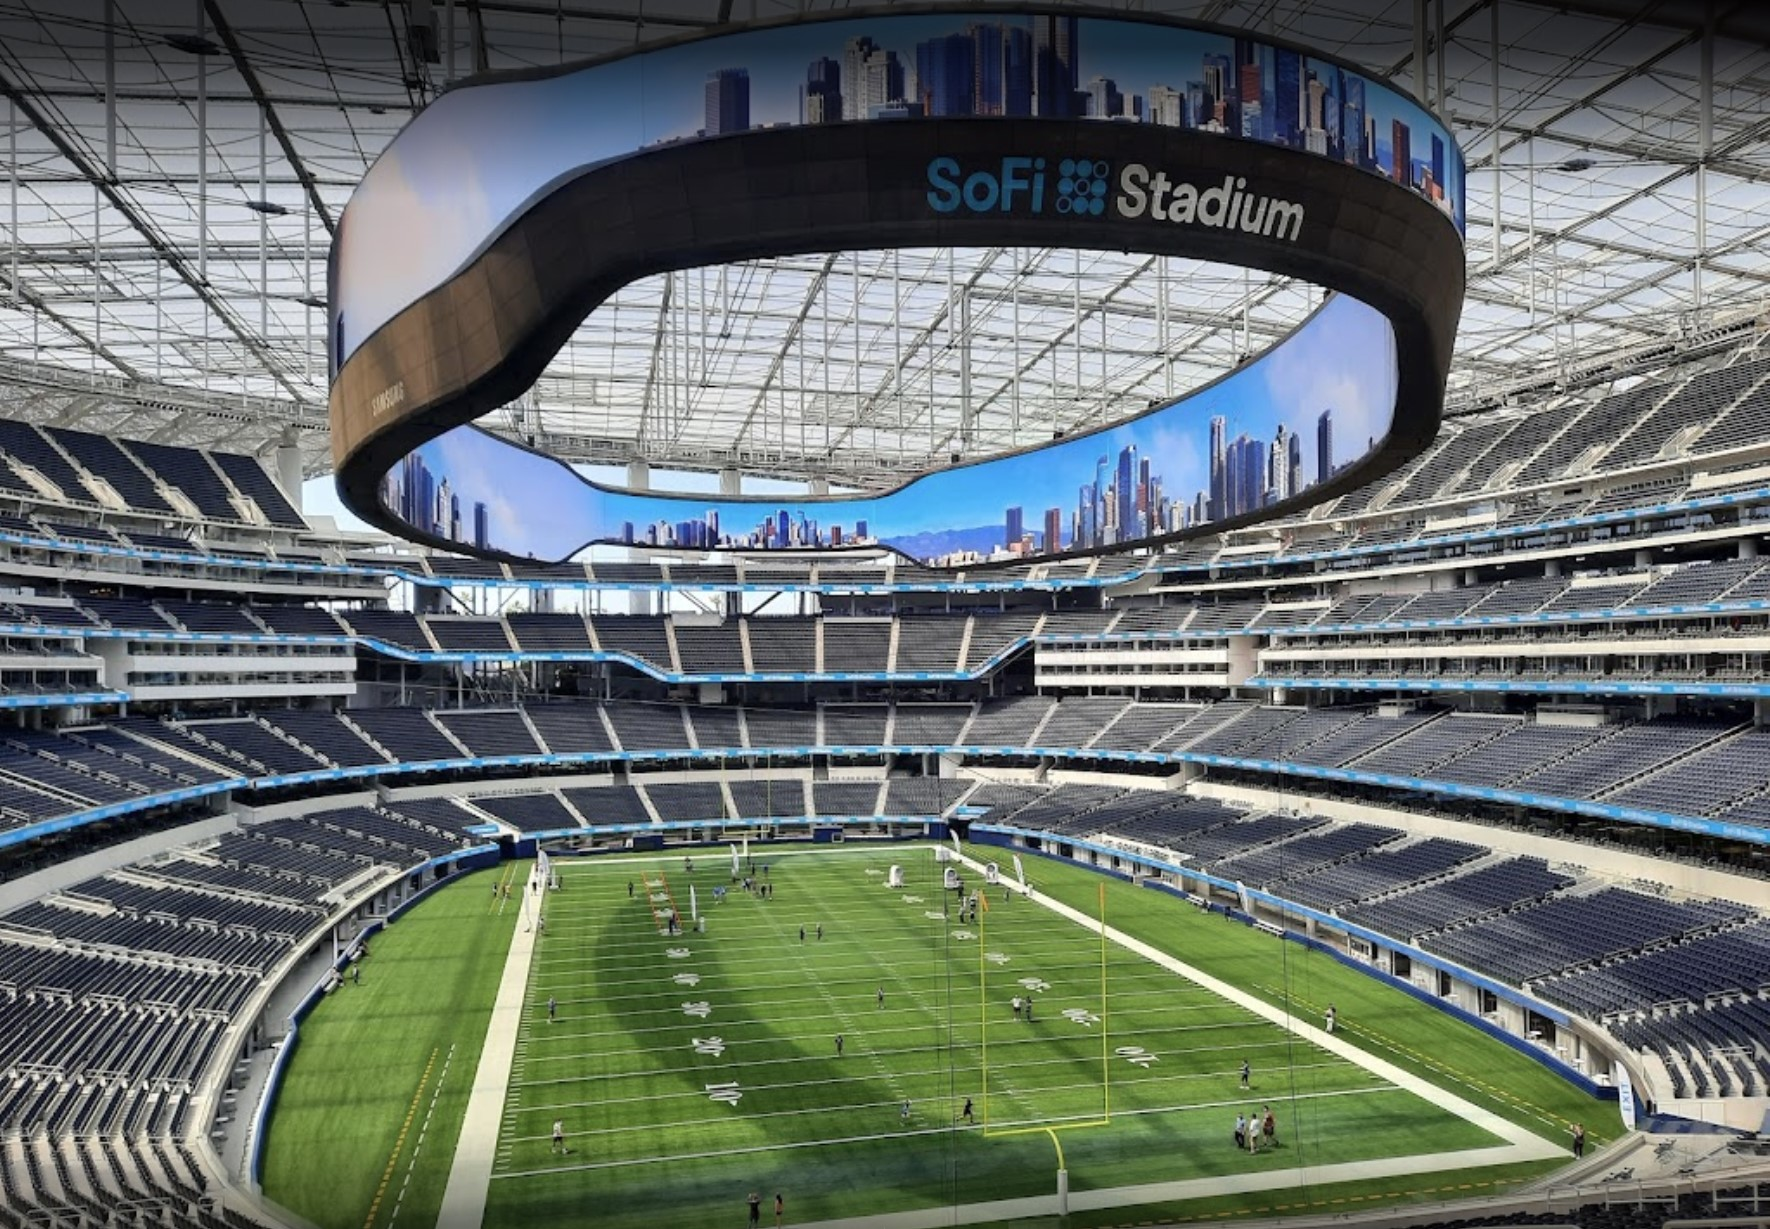 Samsung The Infinity Screen SoFi Stadium